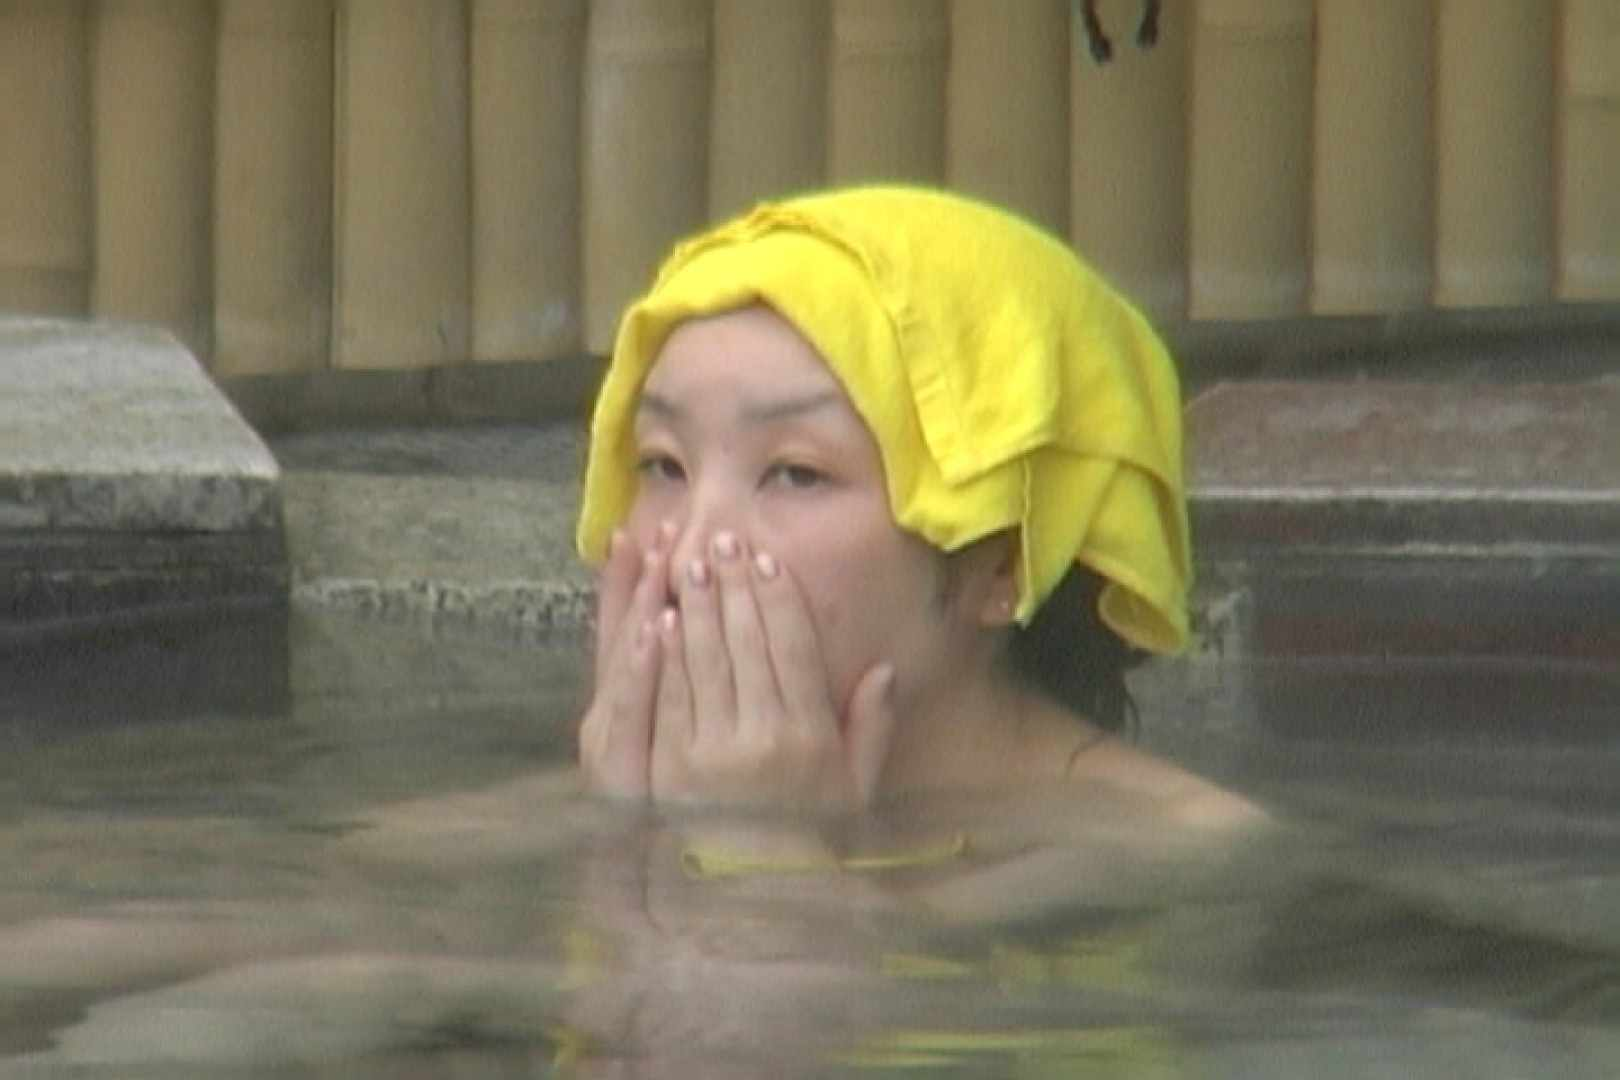 Aquaな露天風呂Vol.542 盗撮  69連発 66